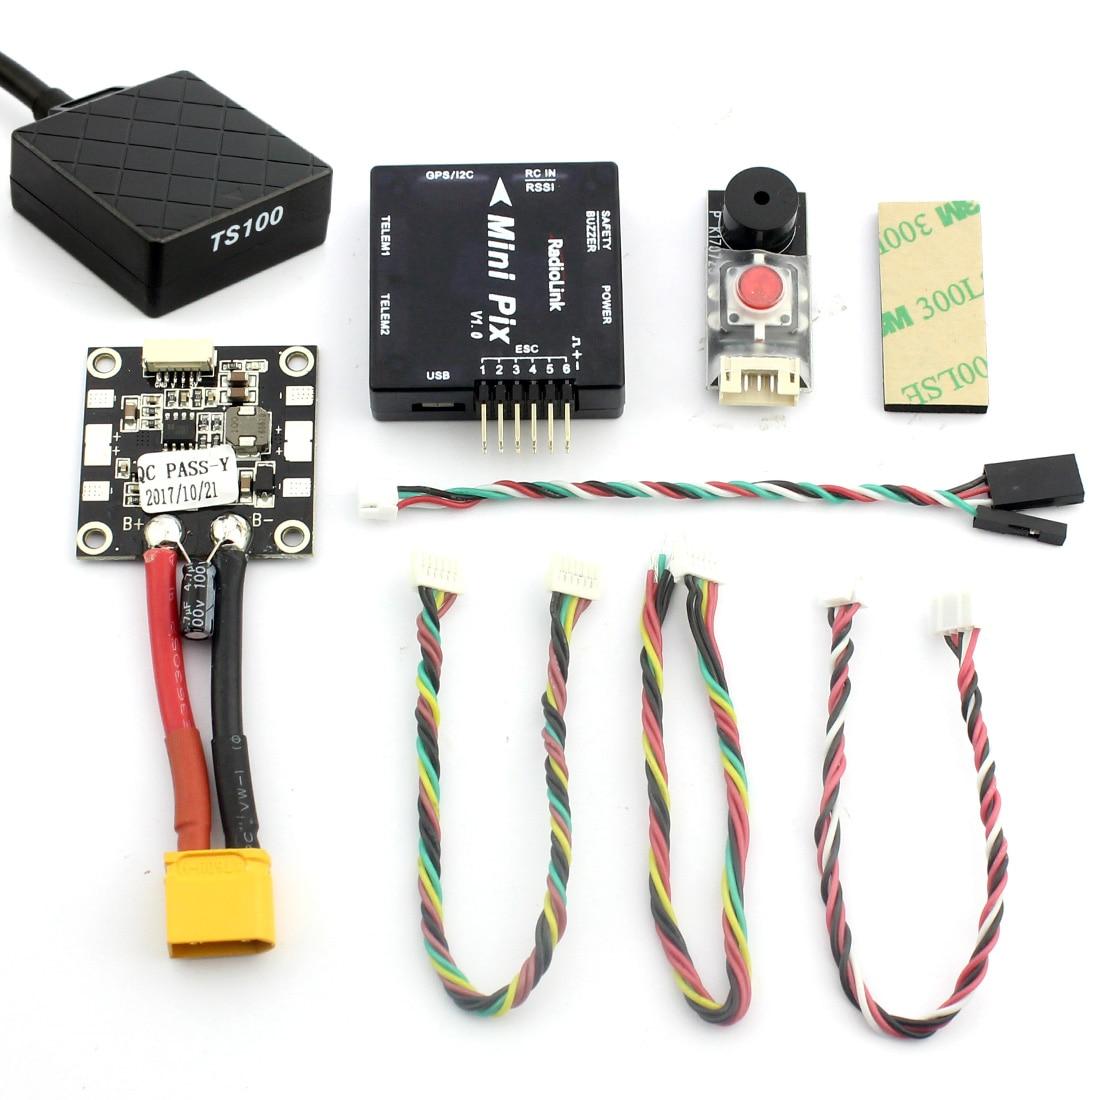 Parts & Accessories Dynamic Holybro Tekko32 F3 35a Esc Blheli_32 3-6s F3 Mcu Dshot1200 Build In Current Sensor Ws2812b Led